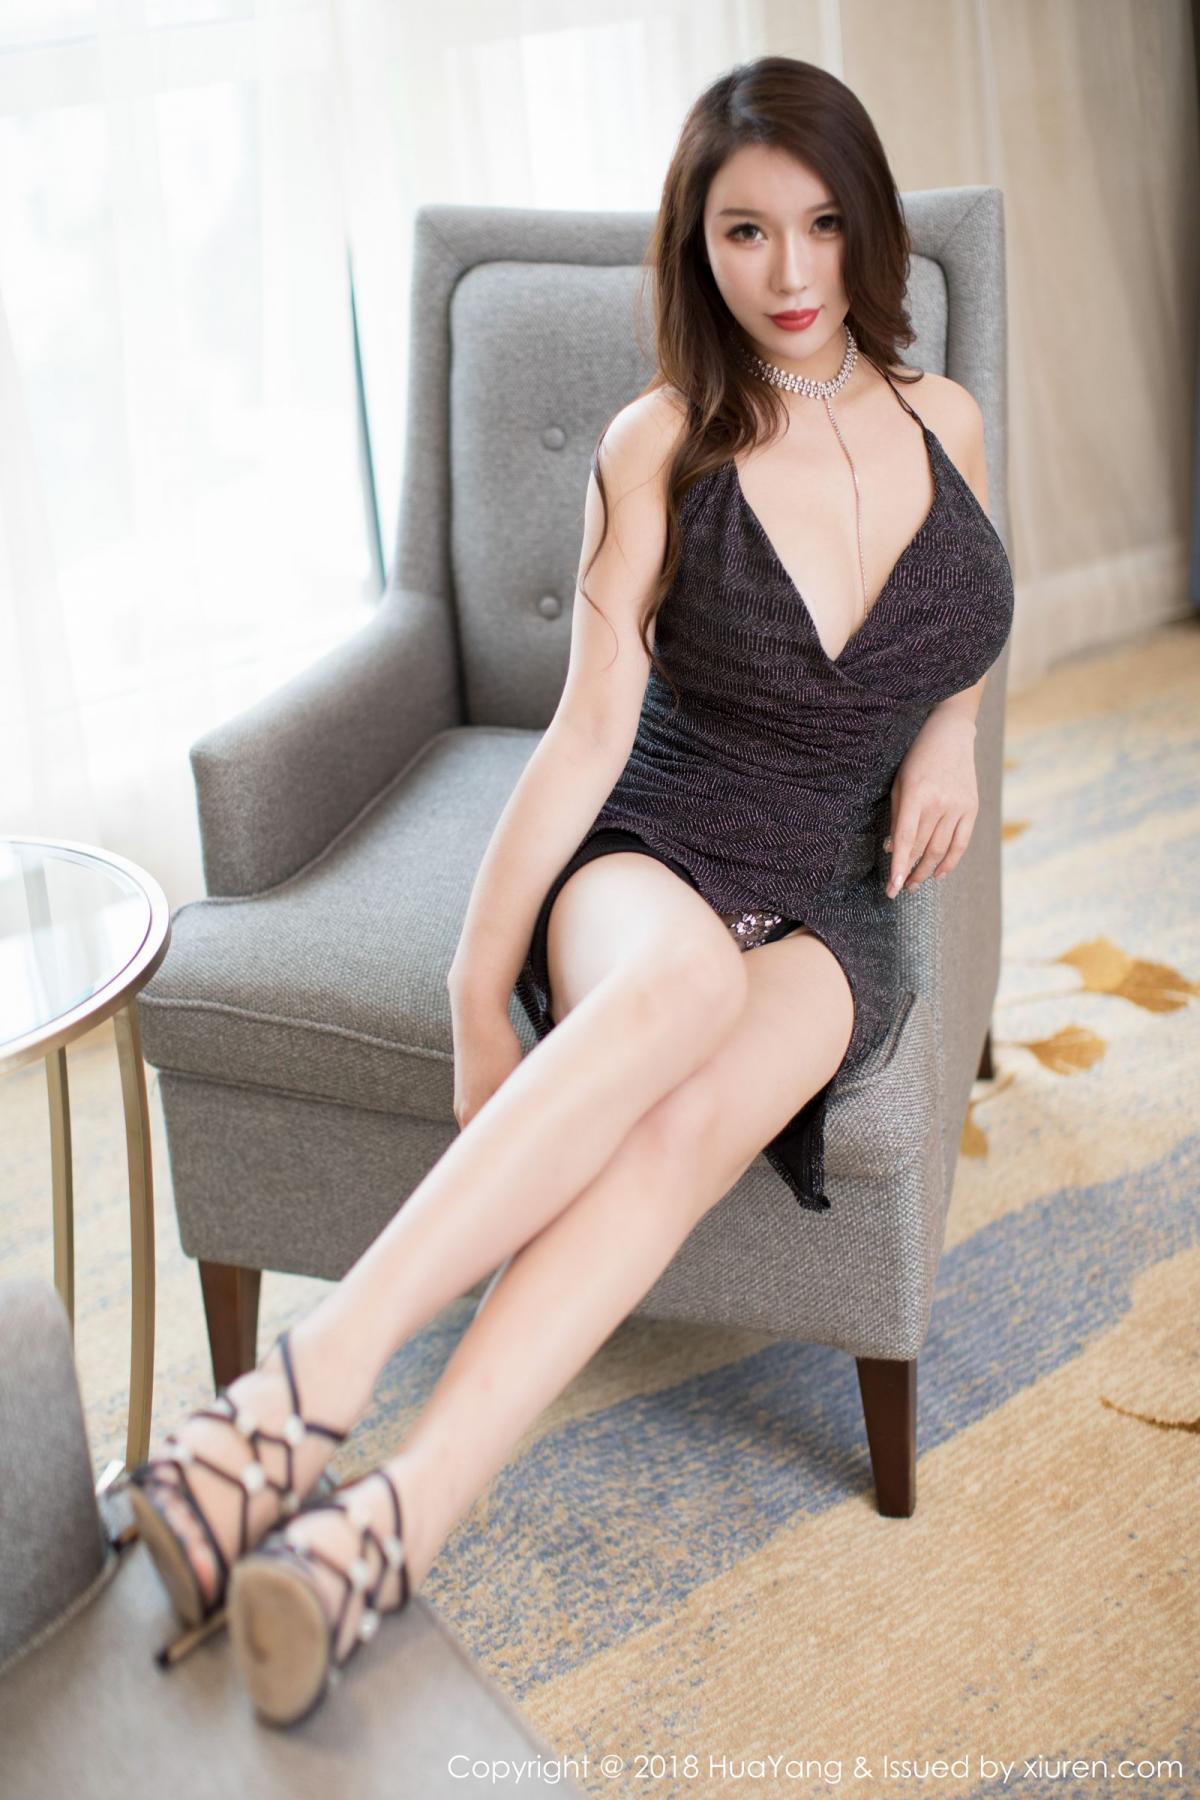 [Huayang] Vol.072 Egg Younisi 25P, Egg Younisi, HuaYang, Underwear